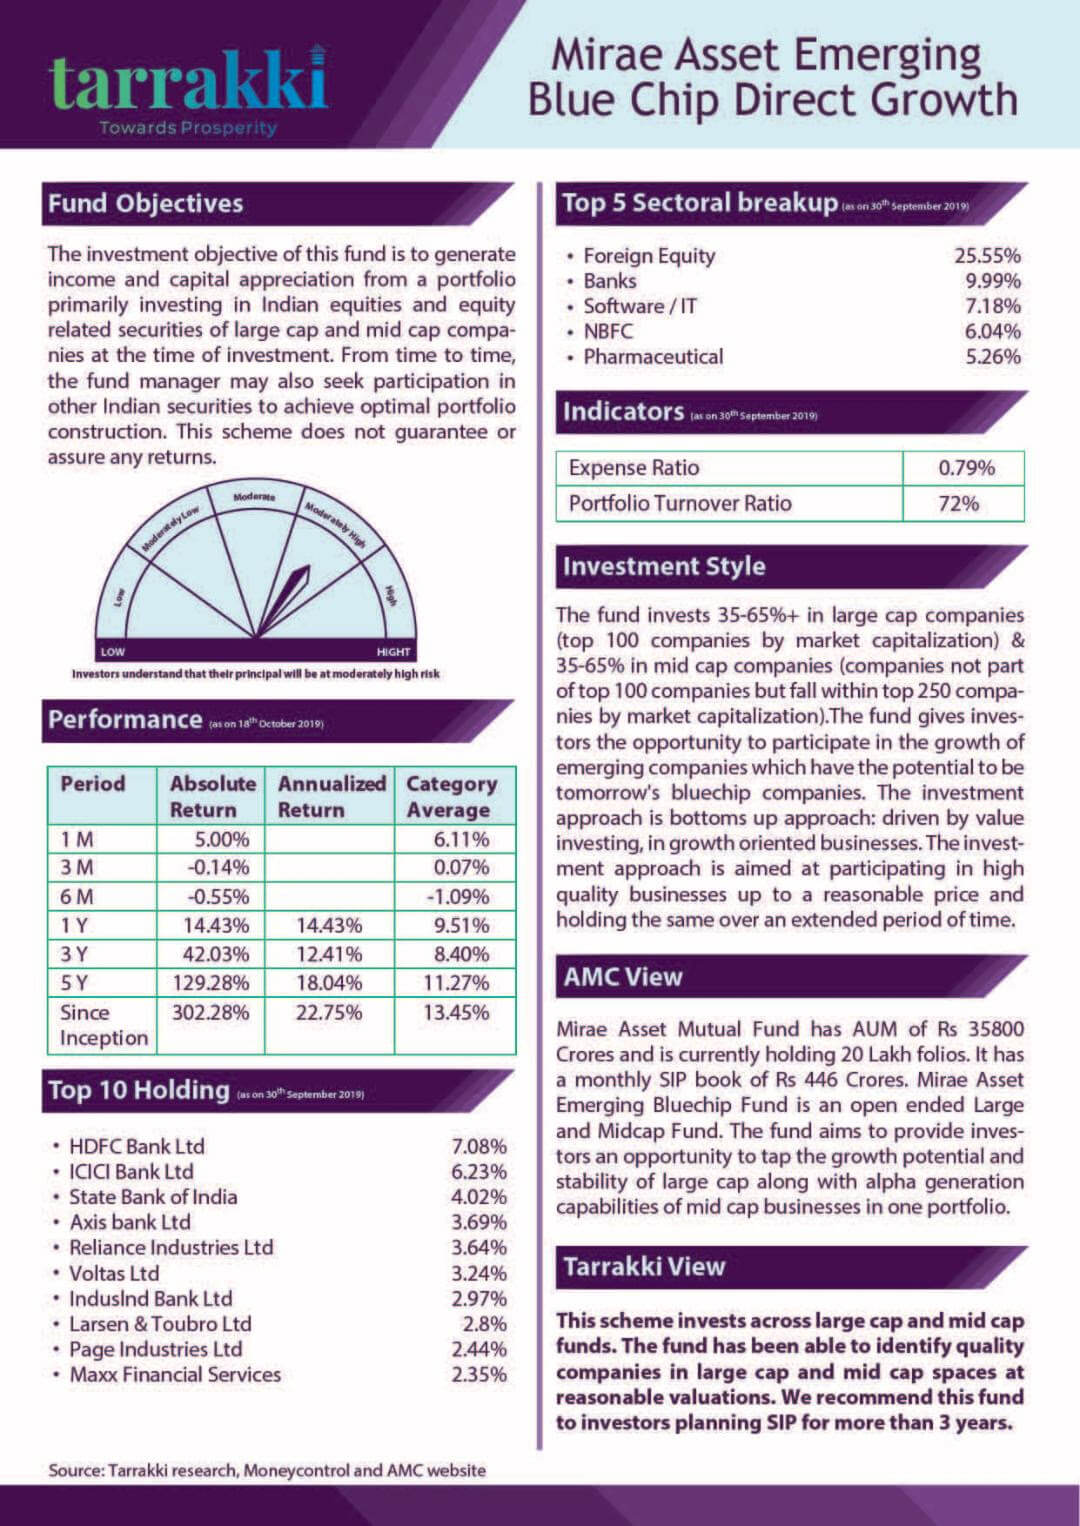 Mirae Asset Emerging Blue Chip Fund